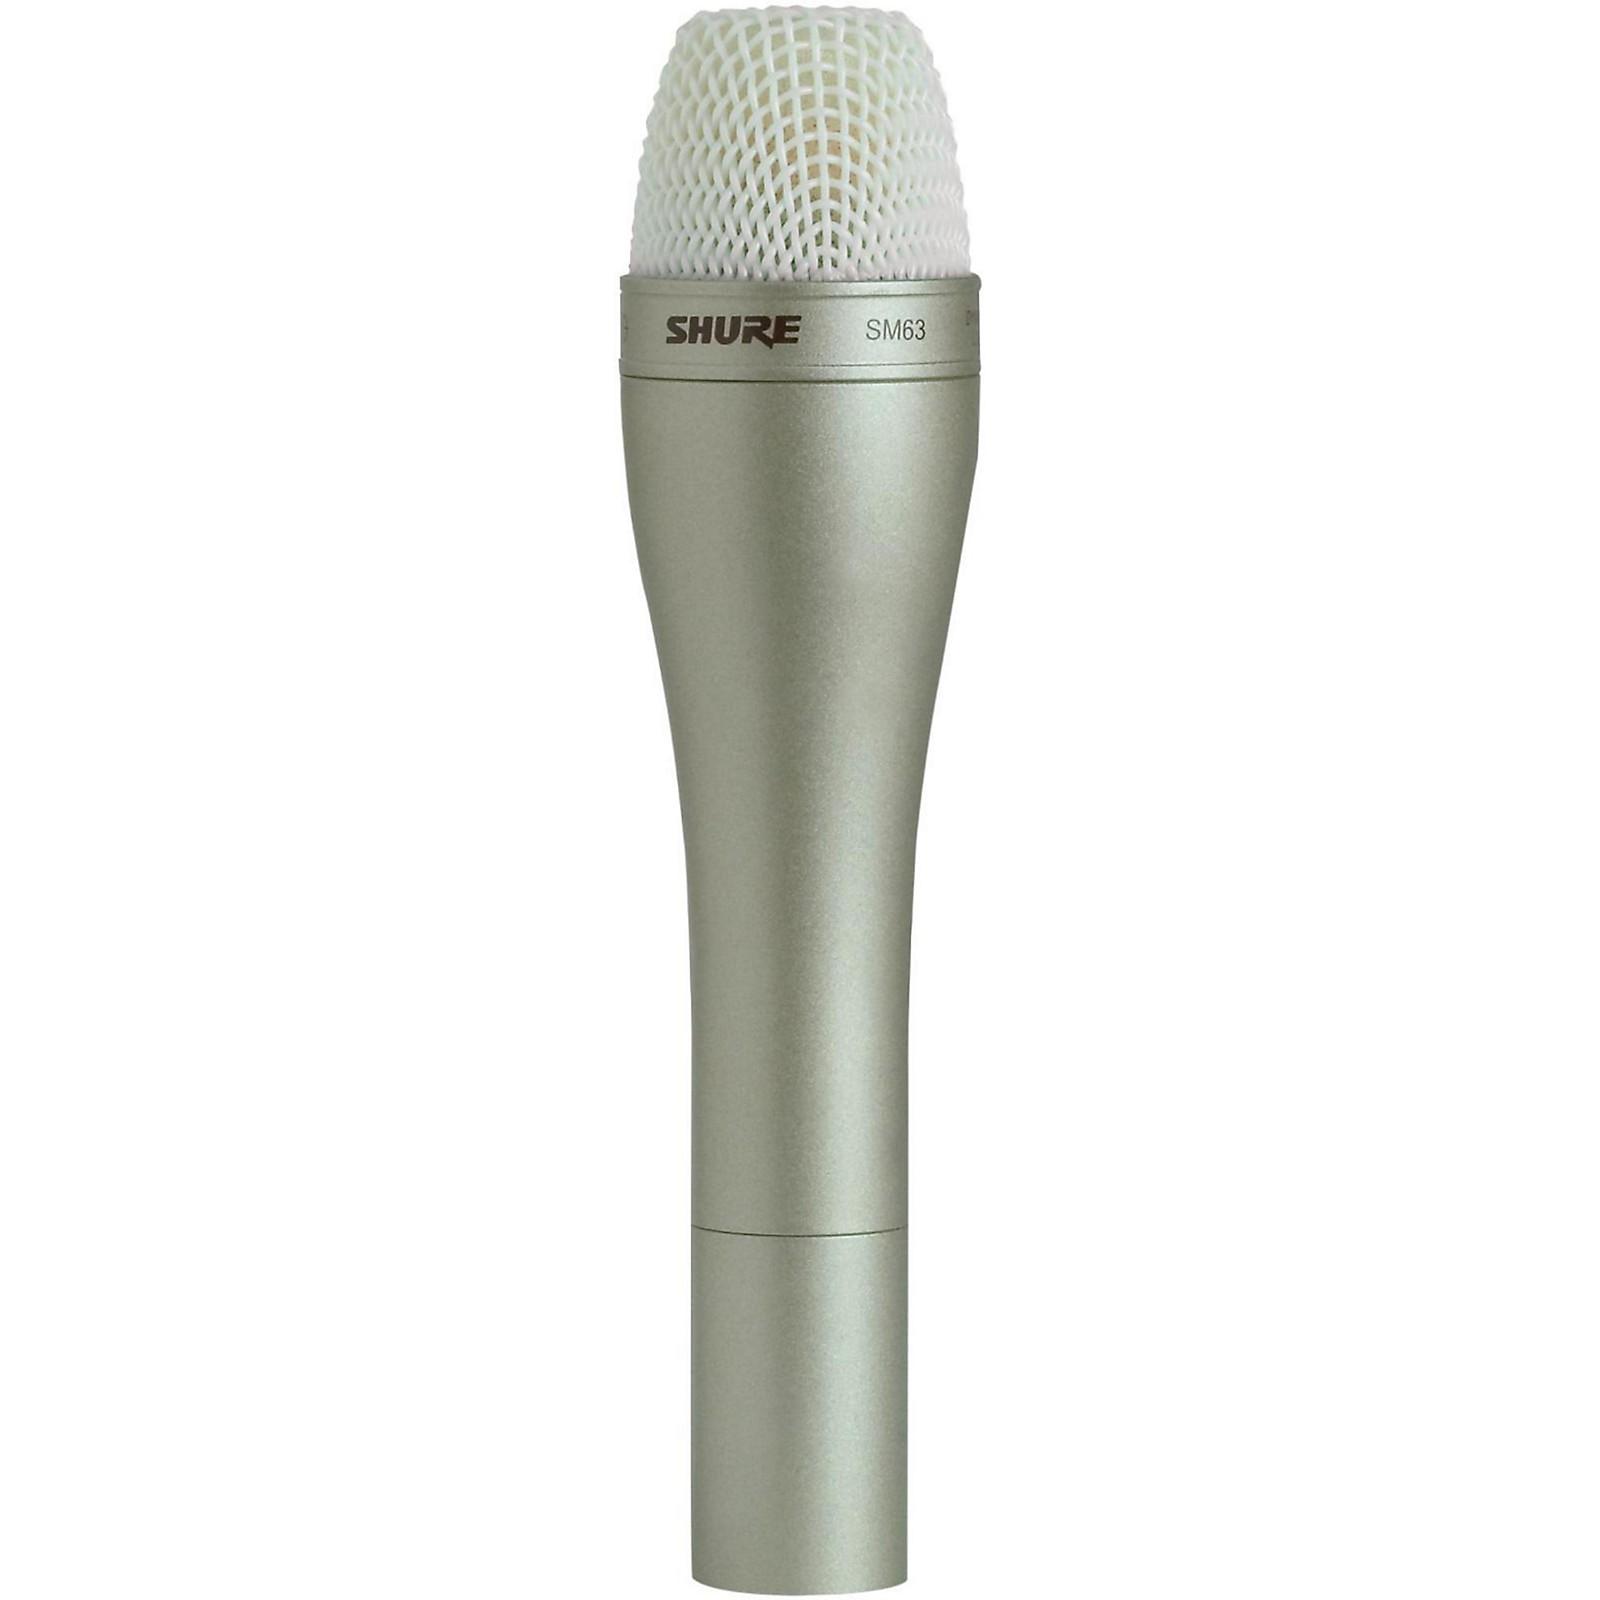 Shure SM63 Handheld Dynamic Omnidirectional Microphone